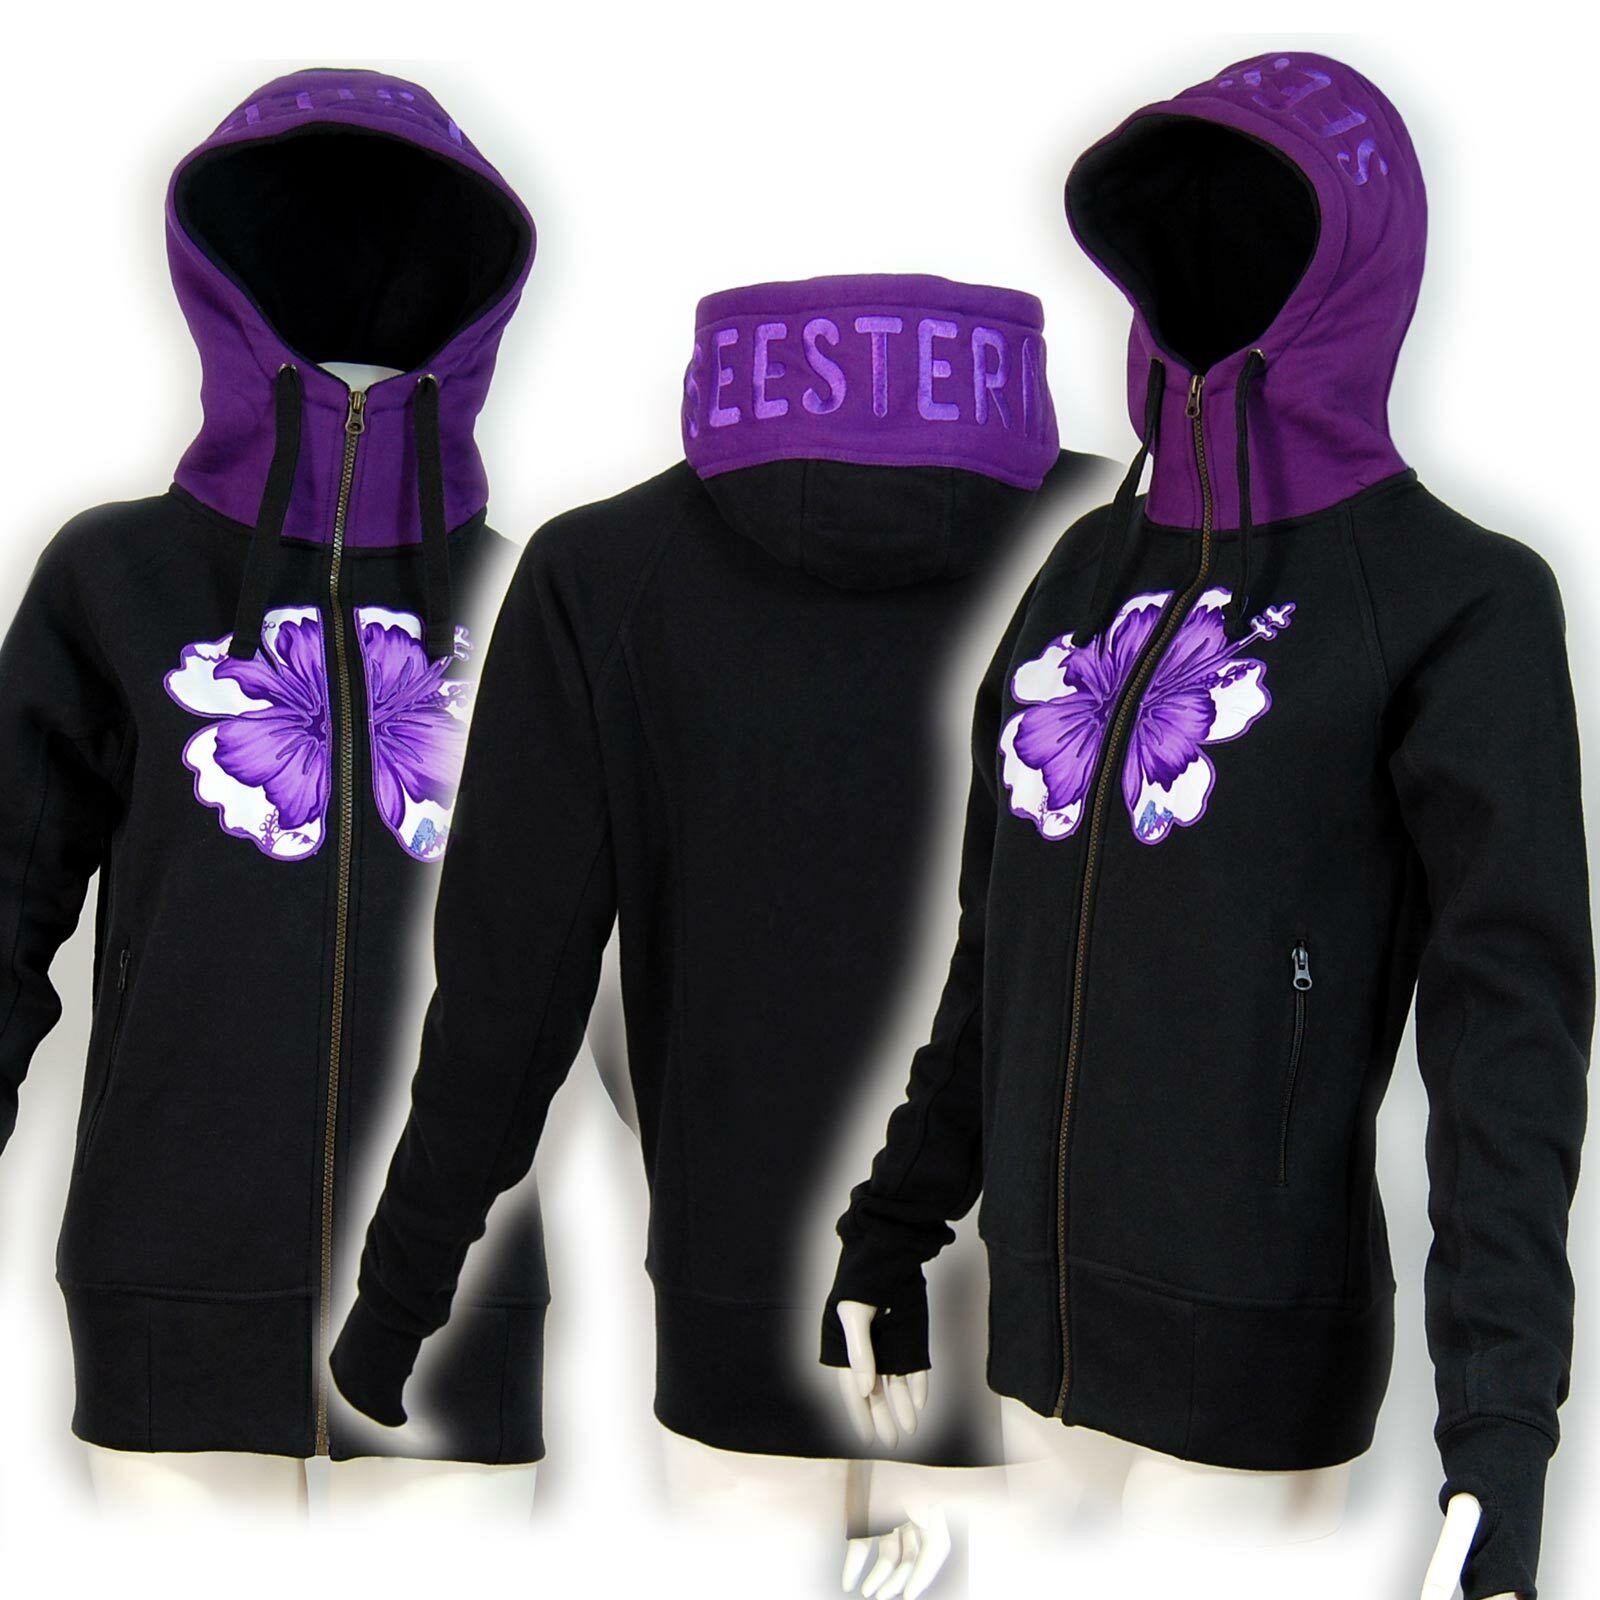 SEESTERN Damen Kapuzen Sweat Shirt Jacke Kapuzen Pullover Hoody Sweater XS -XXL